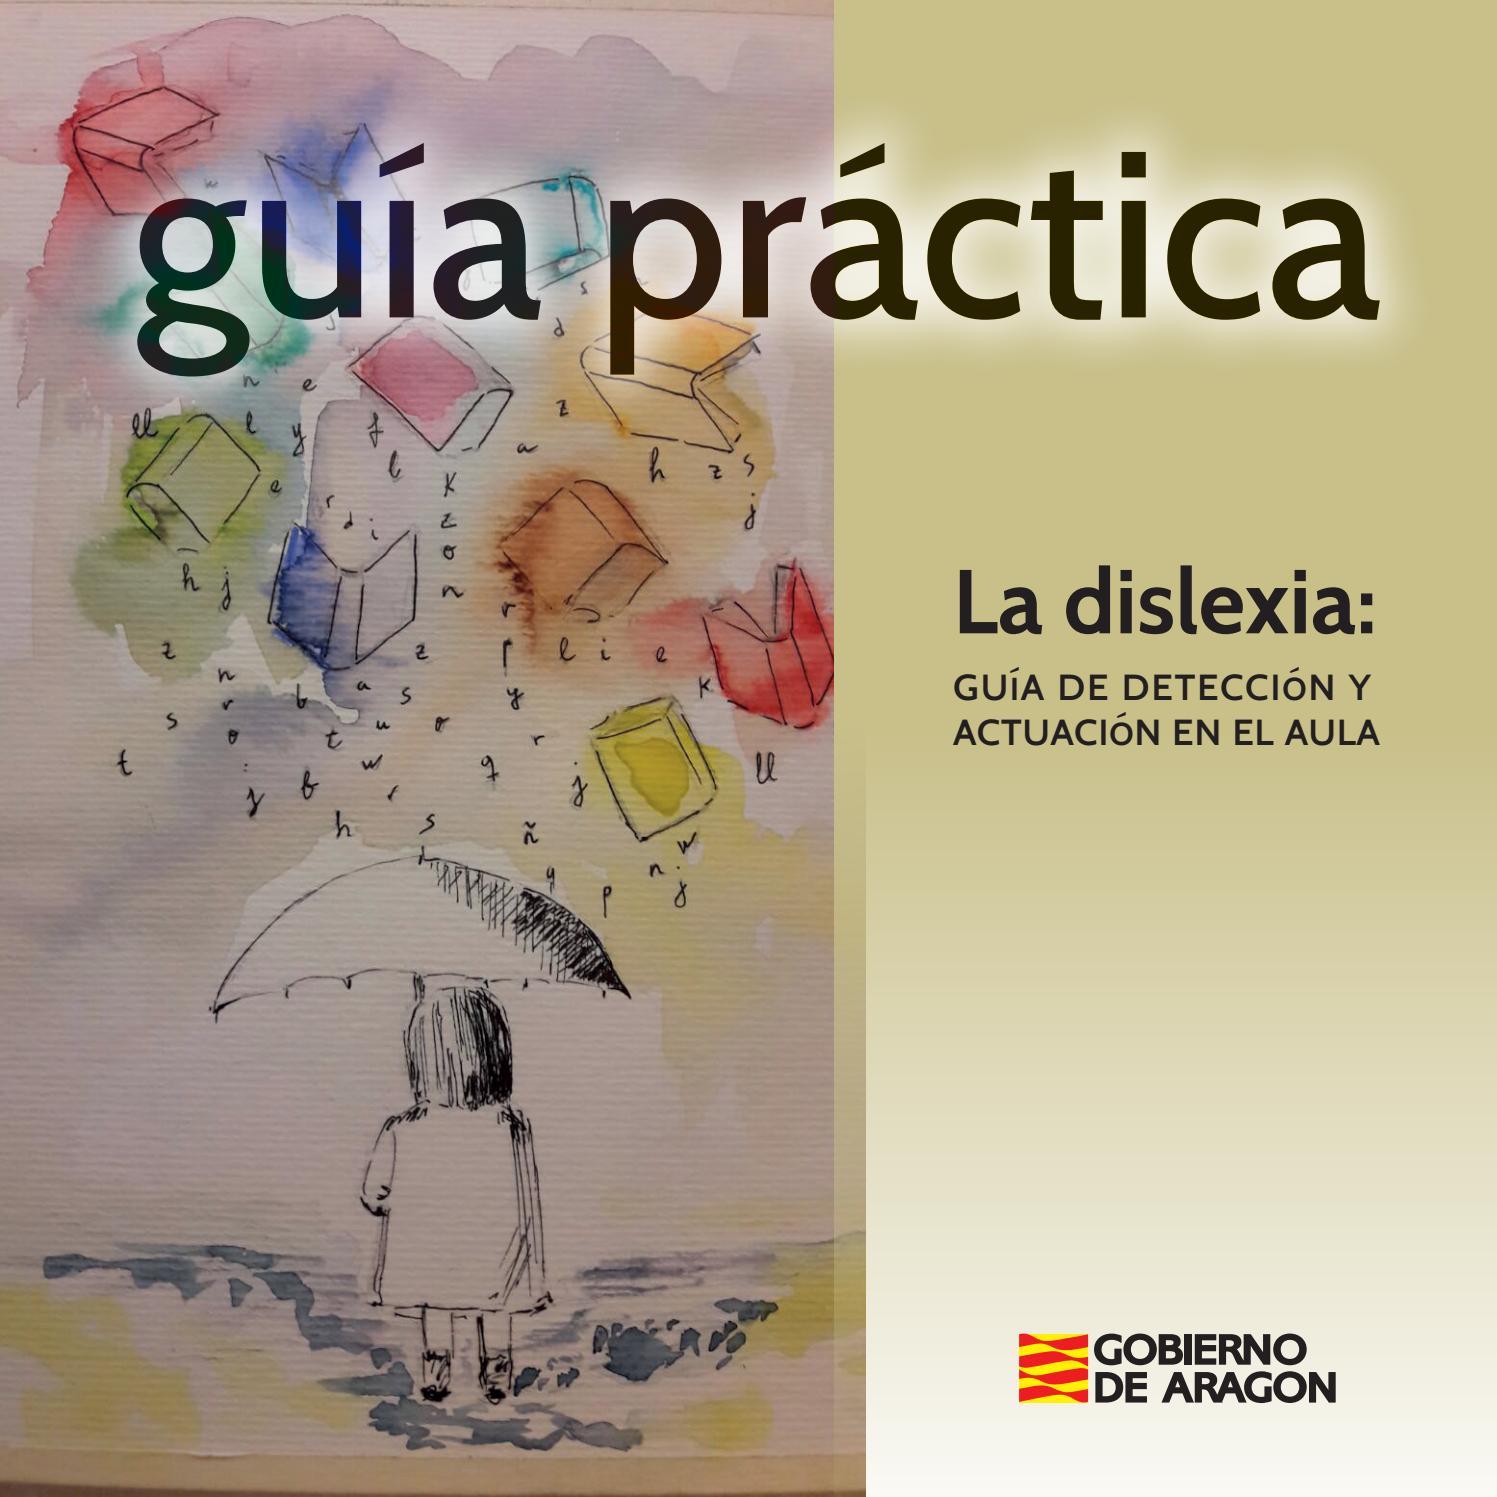 Dislexia Guia Definitiva 04102017 By Orientacion En Galicia Issuu